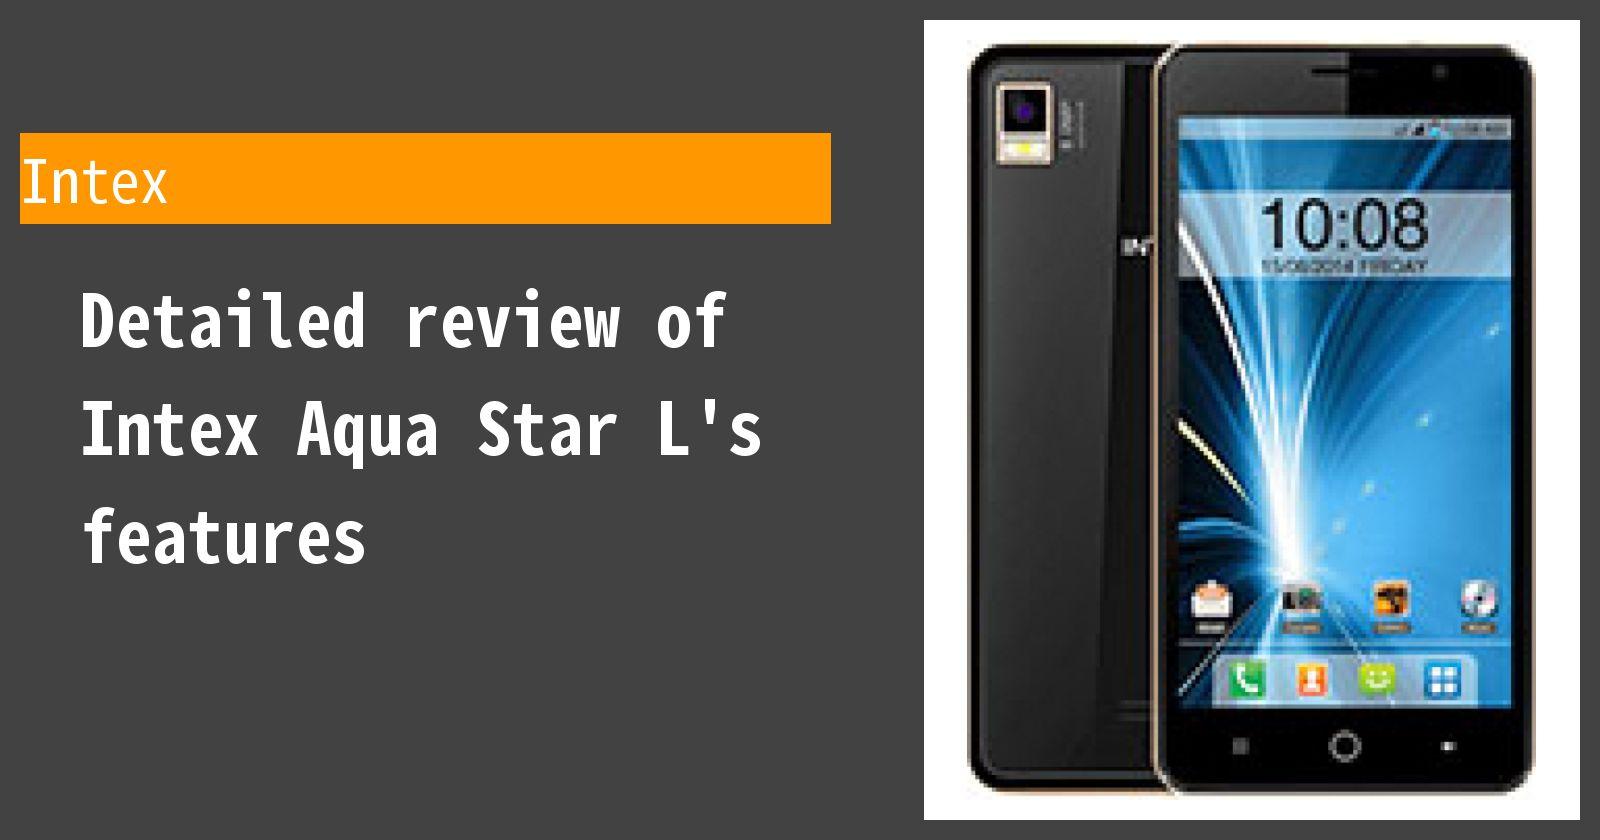 Detailed review of Intex Aqua Star L's features